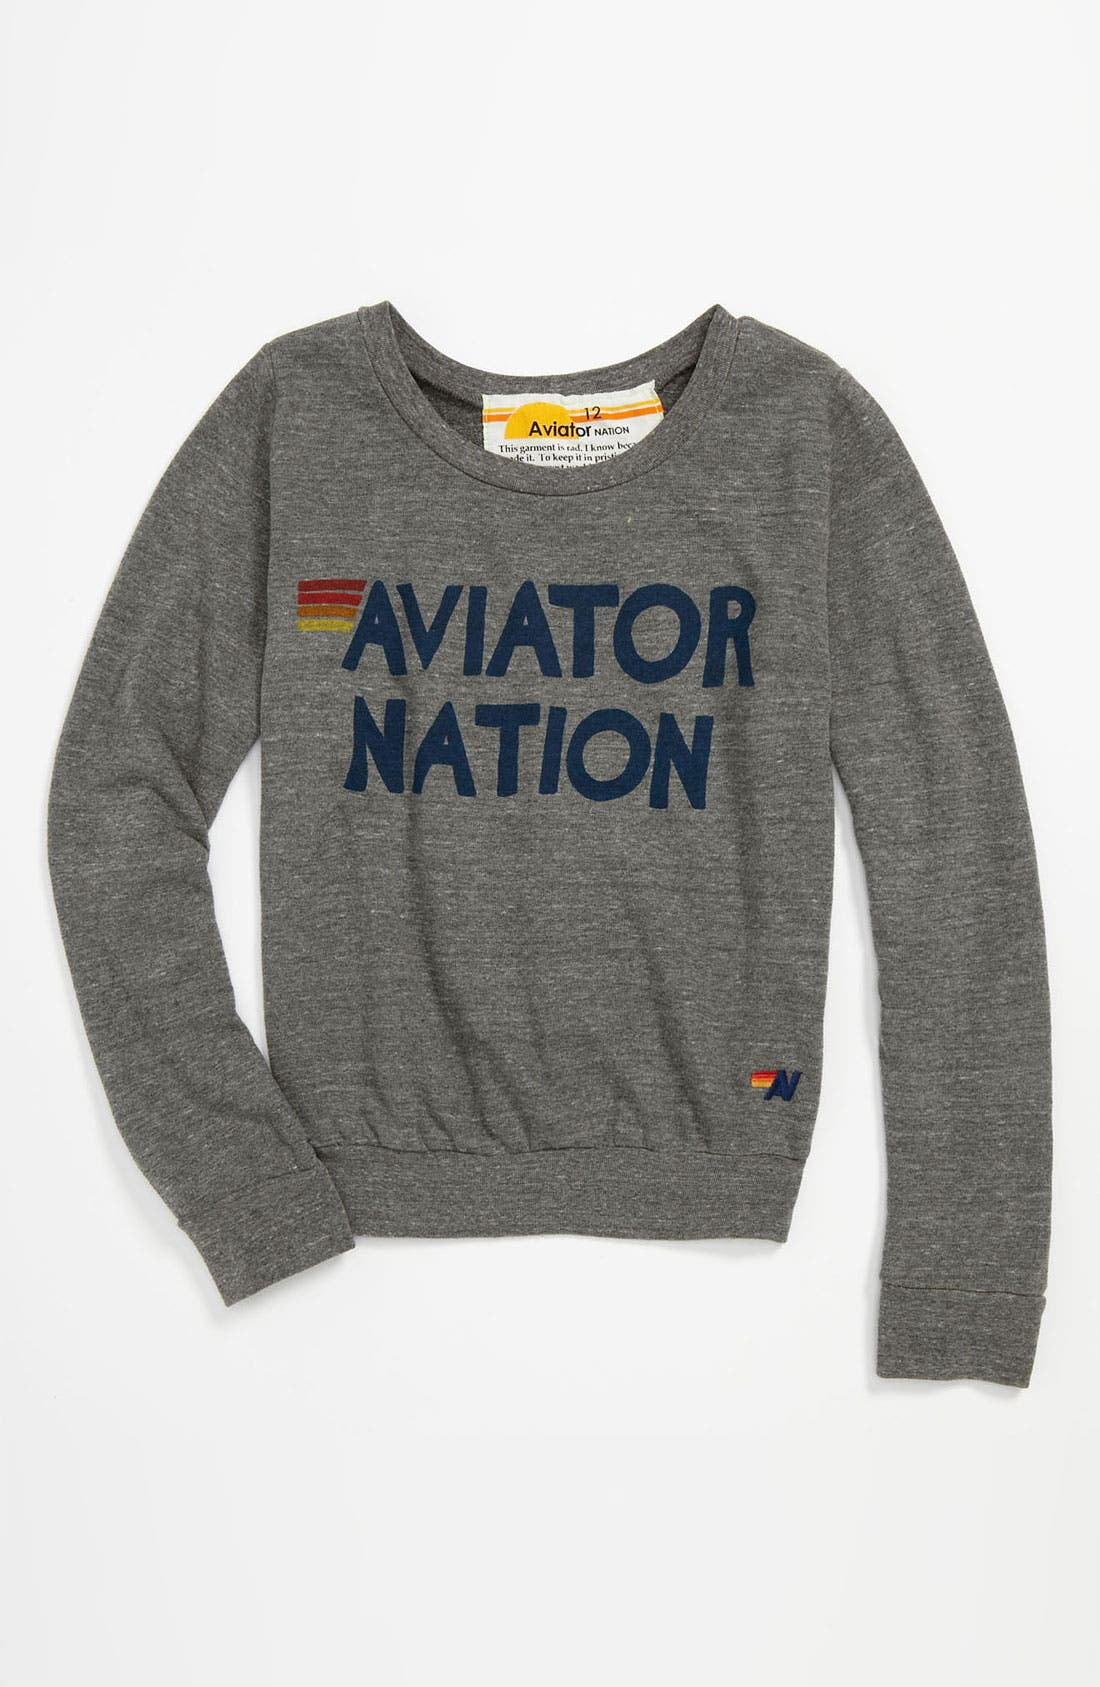 Alternate Image 1 Selected - Aviator Nation Sweatshirt (Little Girls & Big Girls)